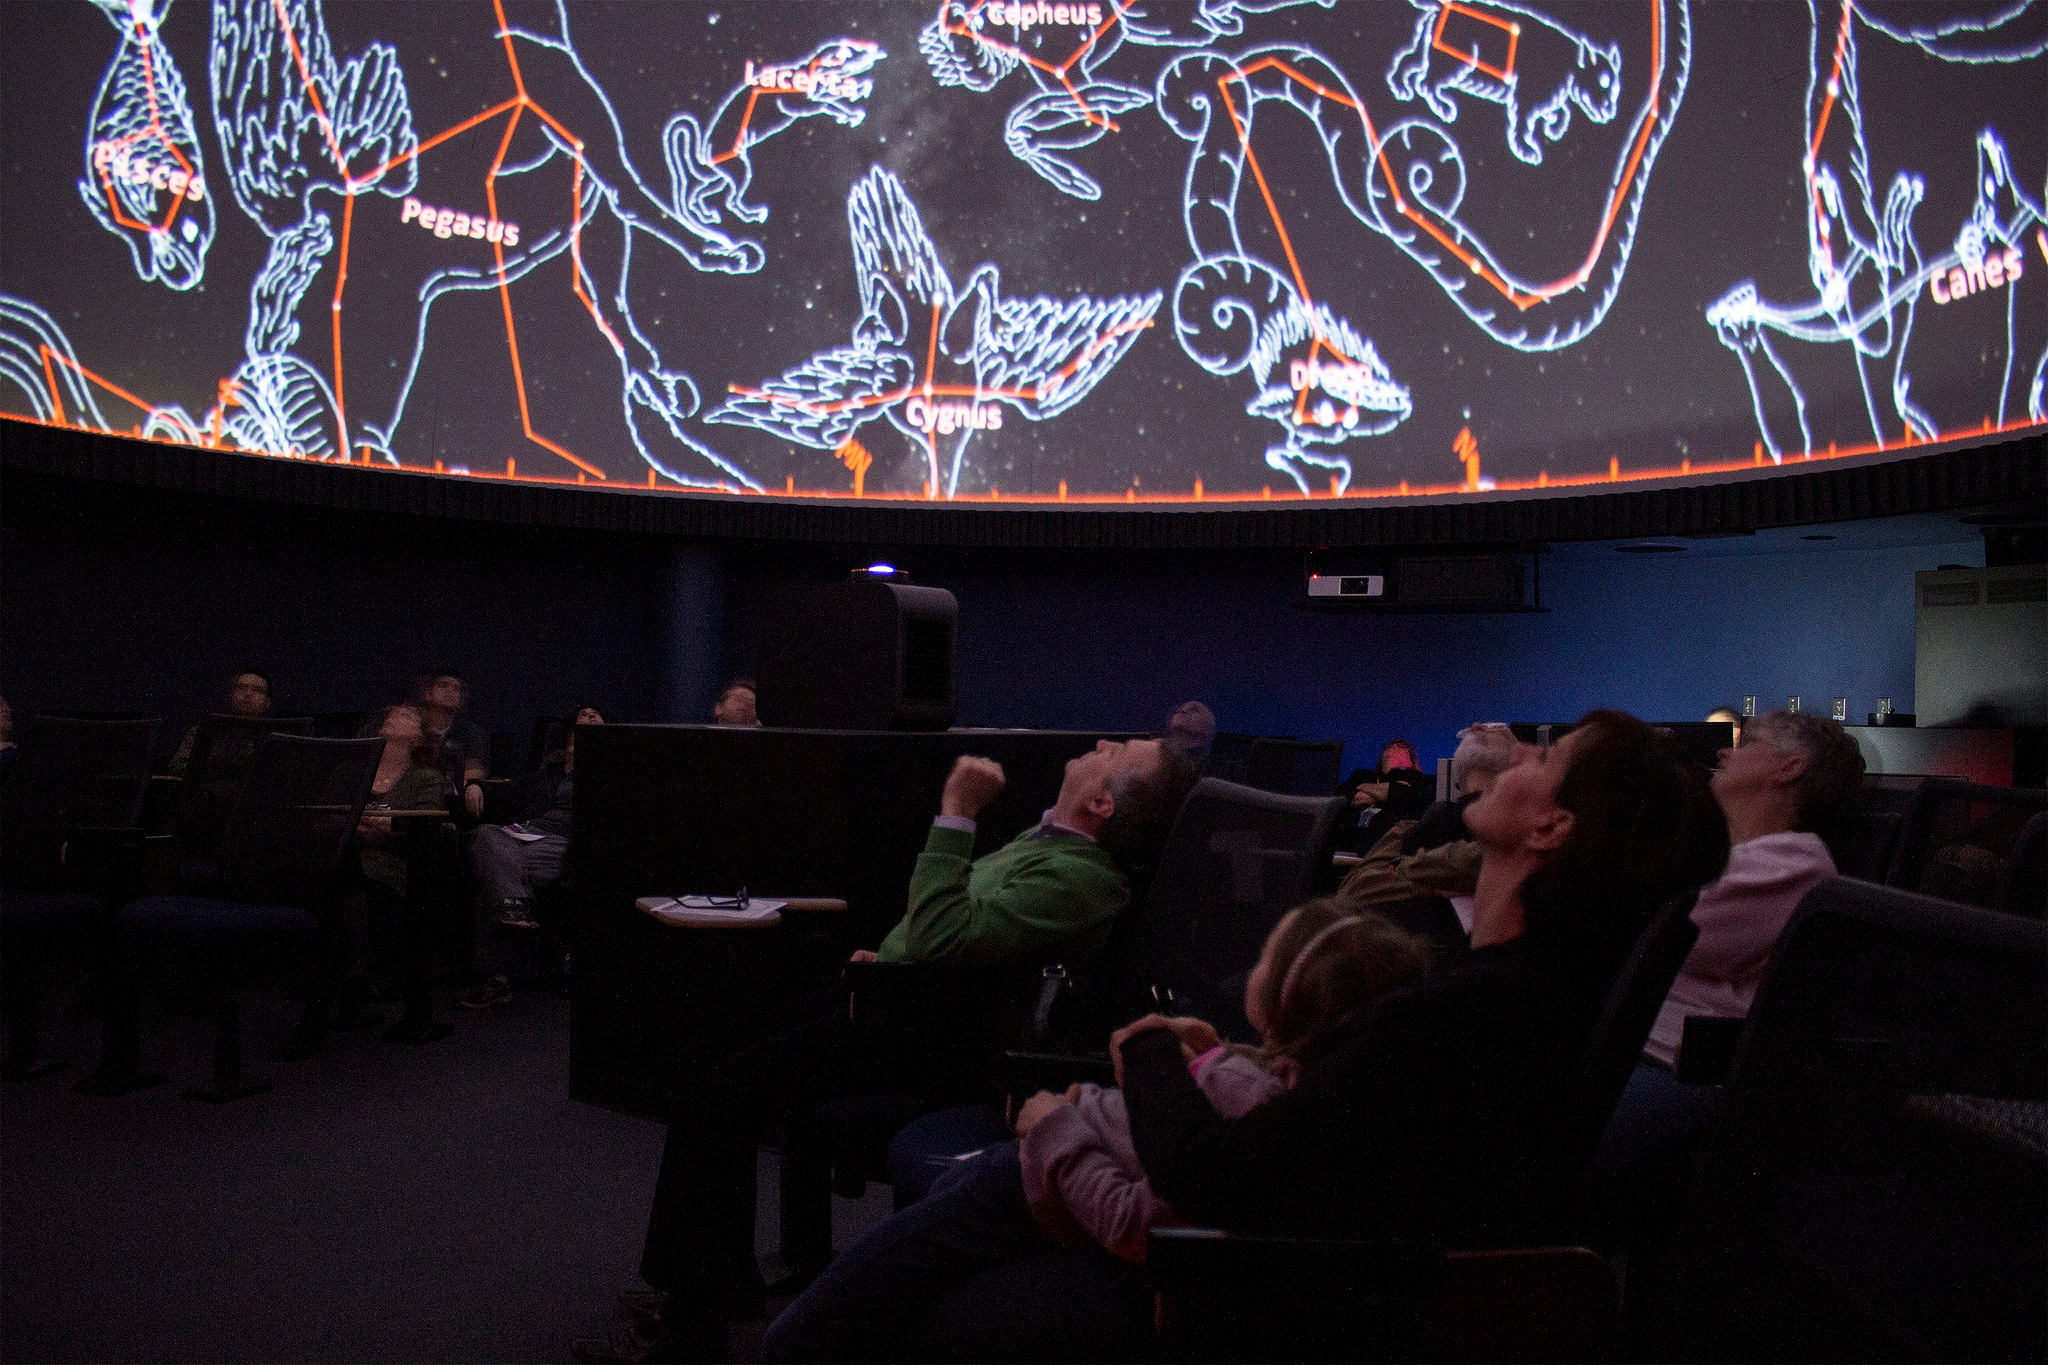 planetarium_show_students1.jpg